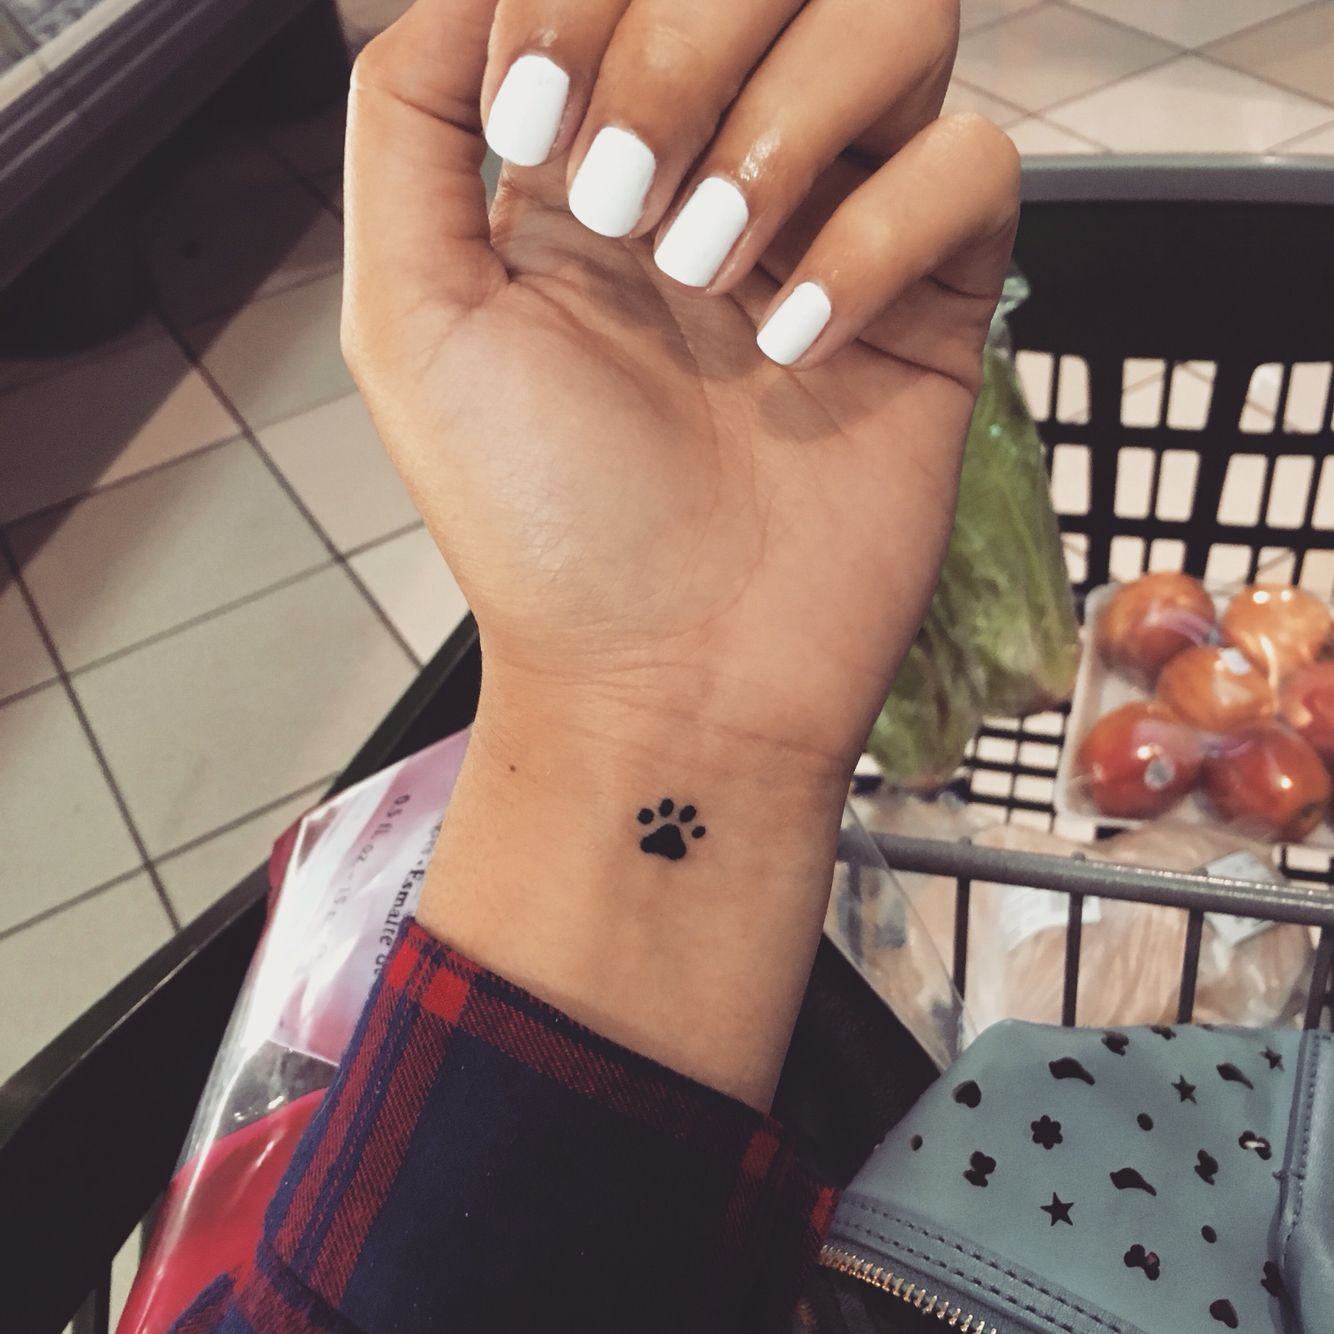 Paw Print Tattoos For Girls: Small Tattoos, Dog Tattoos, Tattoos